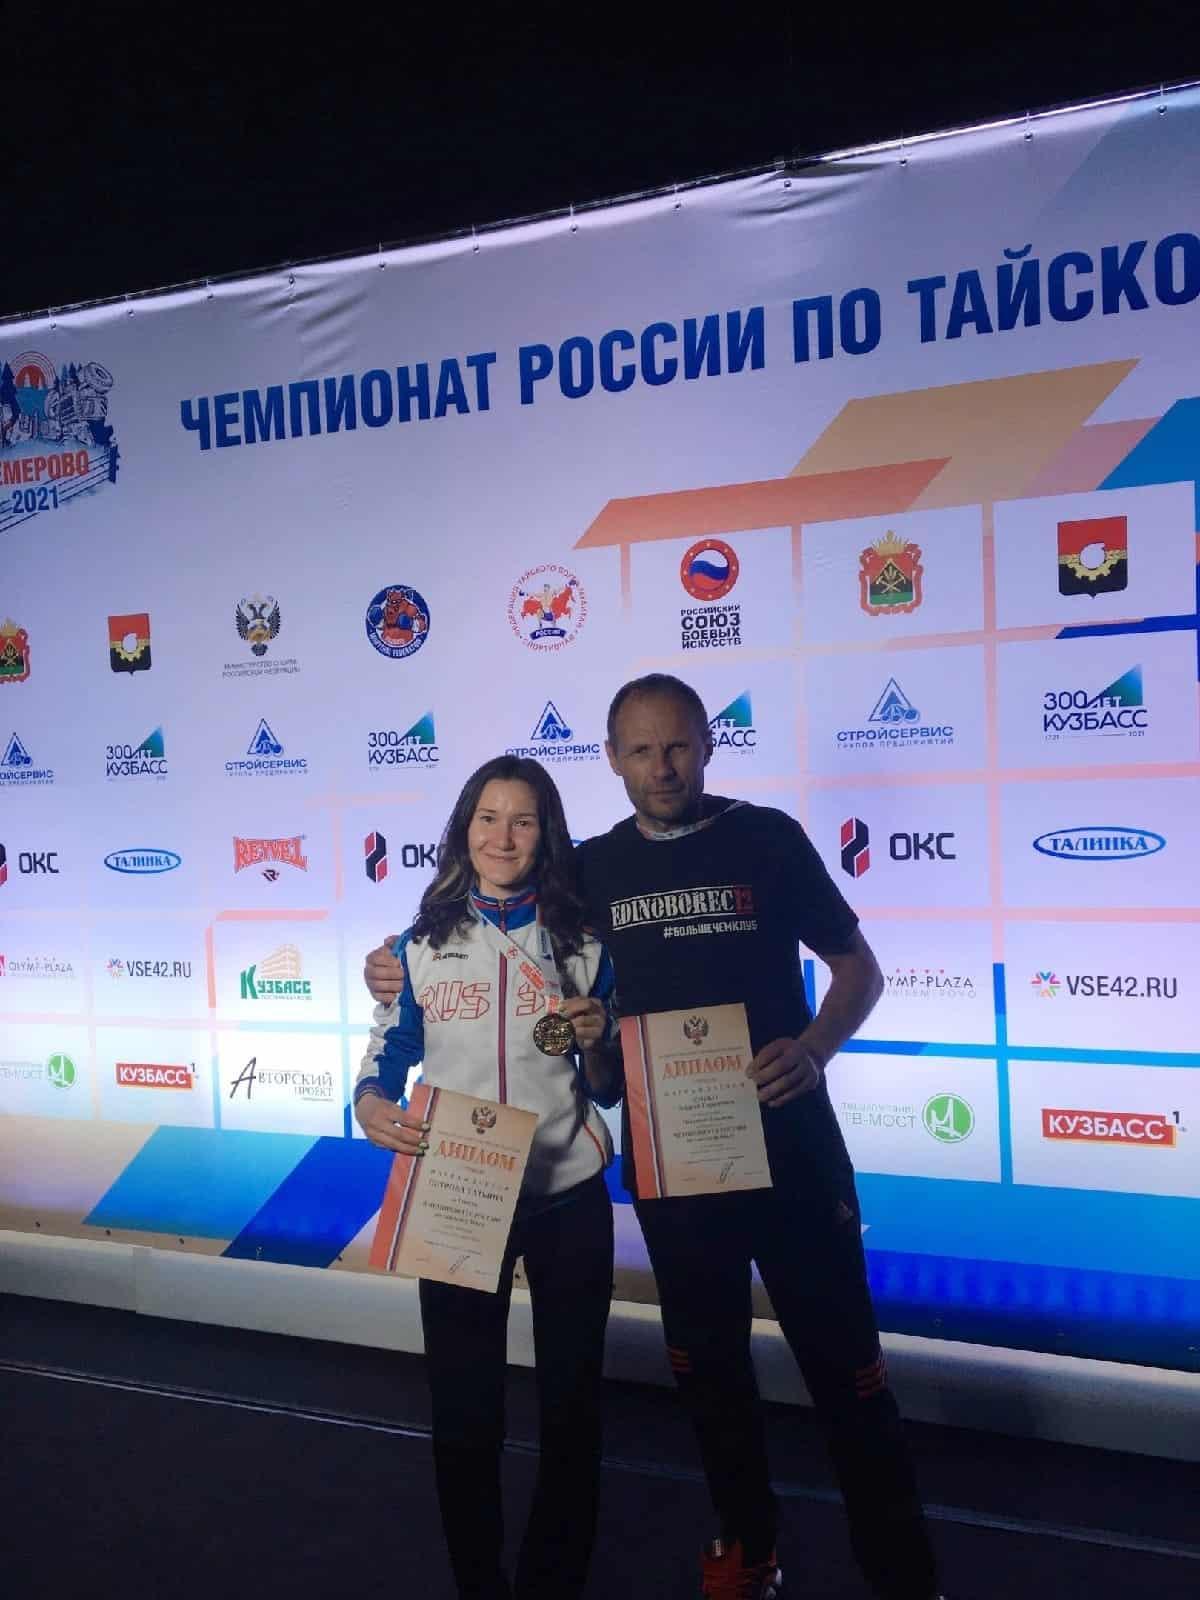 Чемпион по тайскому боксу Татьяна Петрова